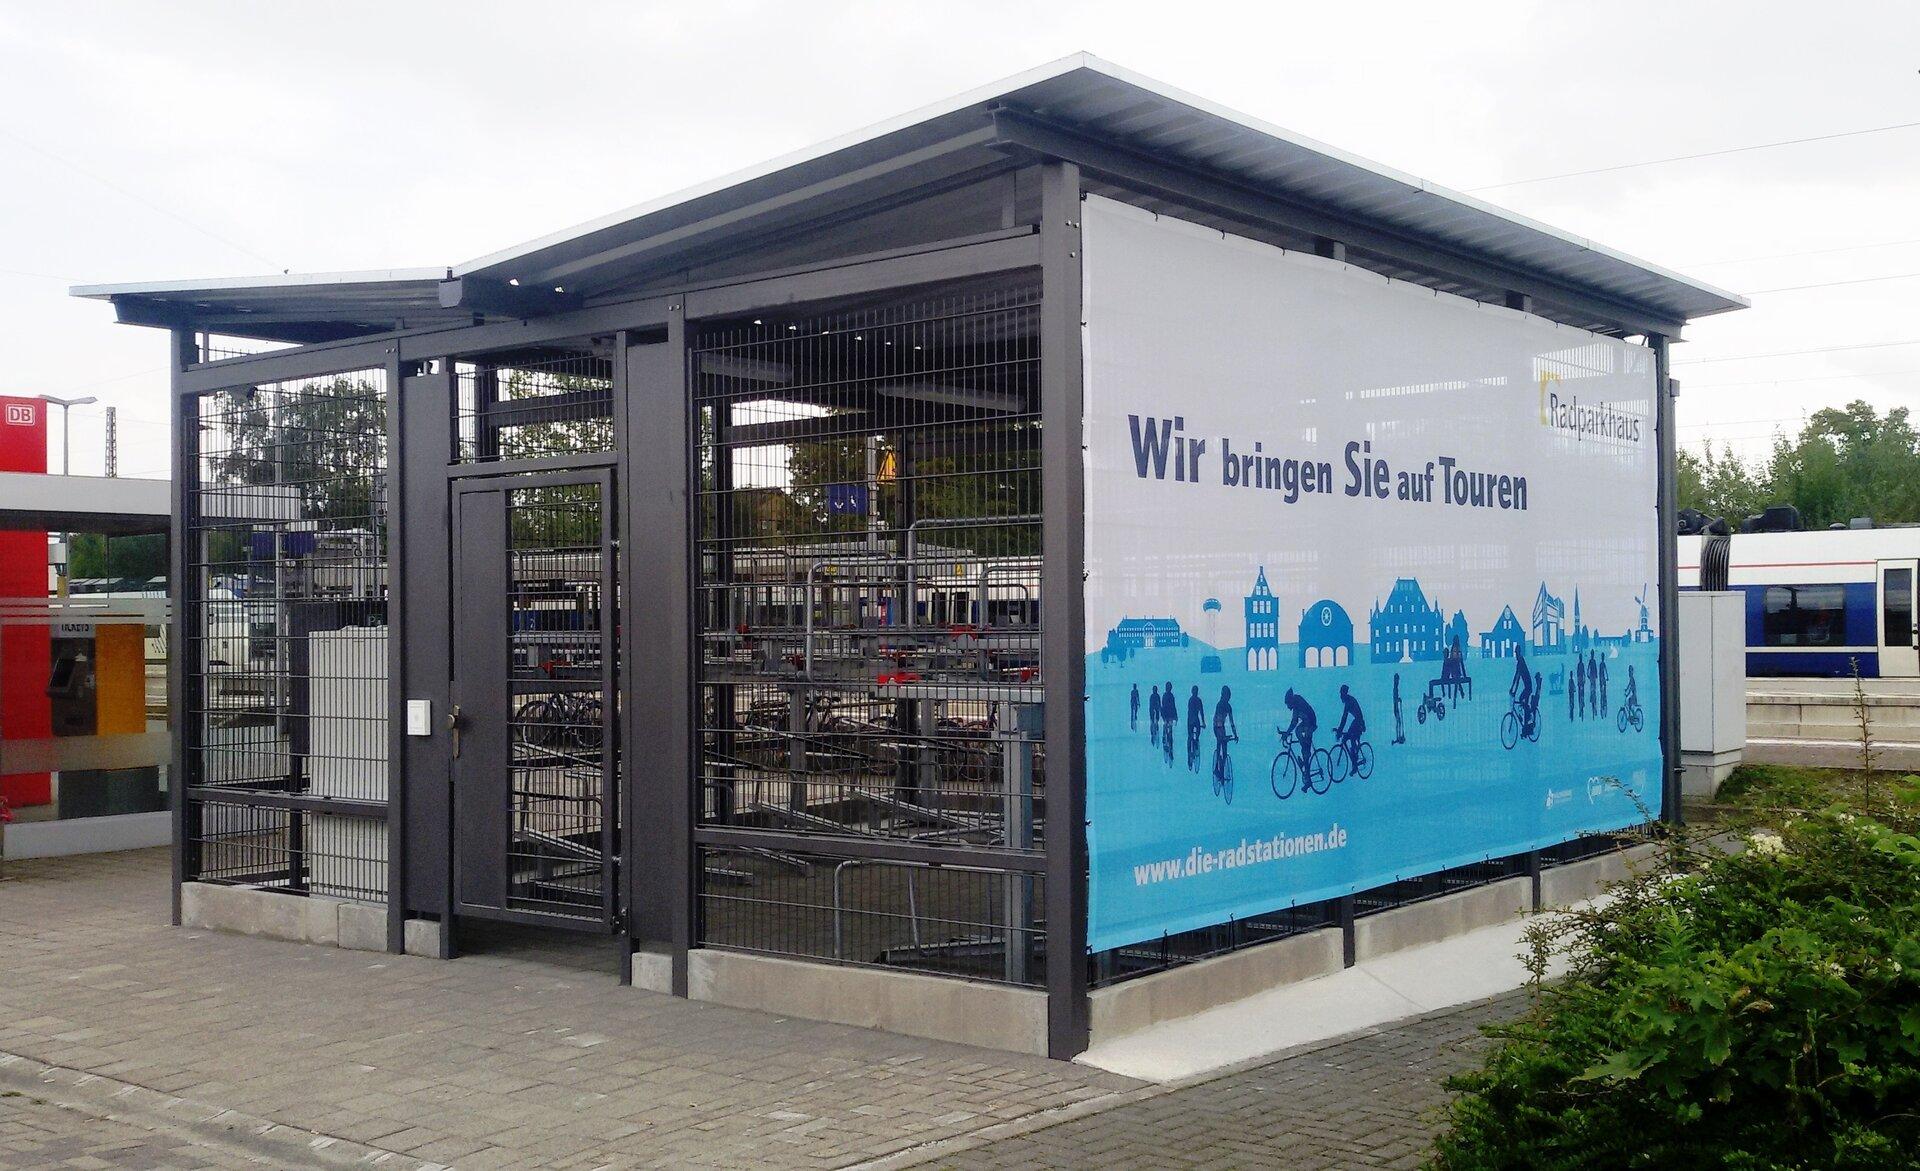 Radparkhaus Bahnhof Holzwickede